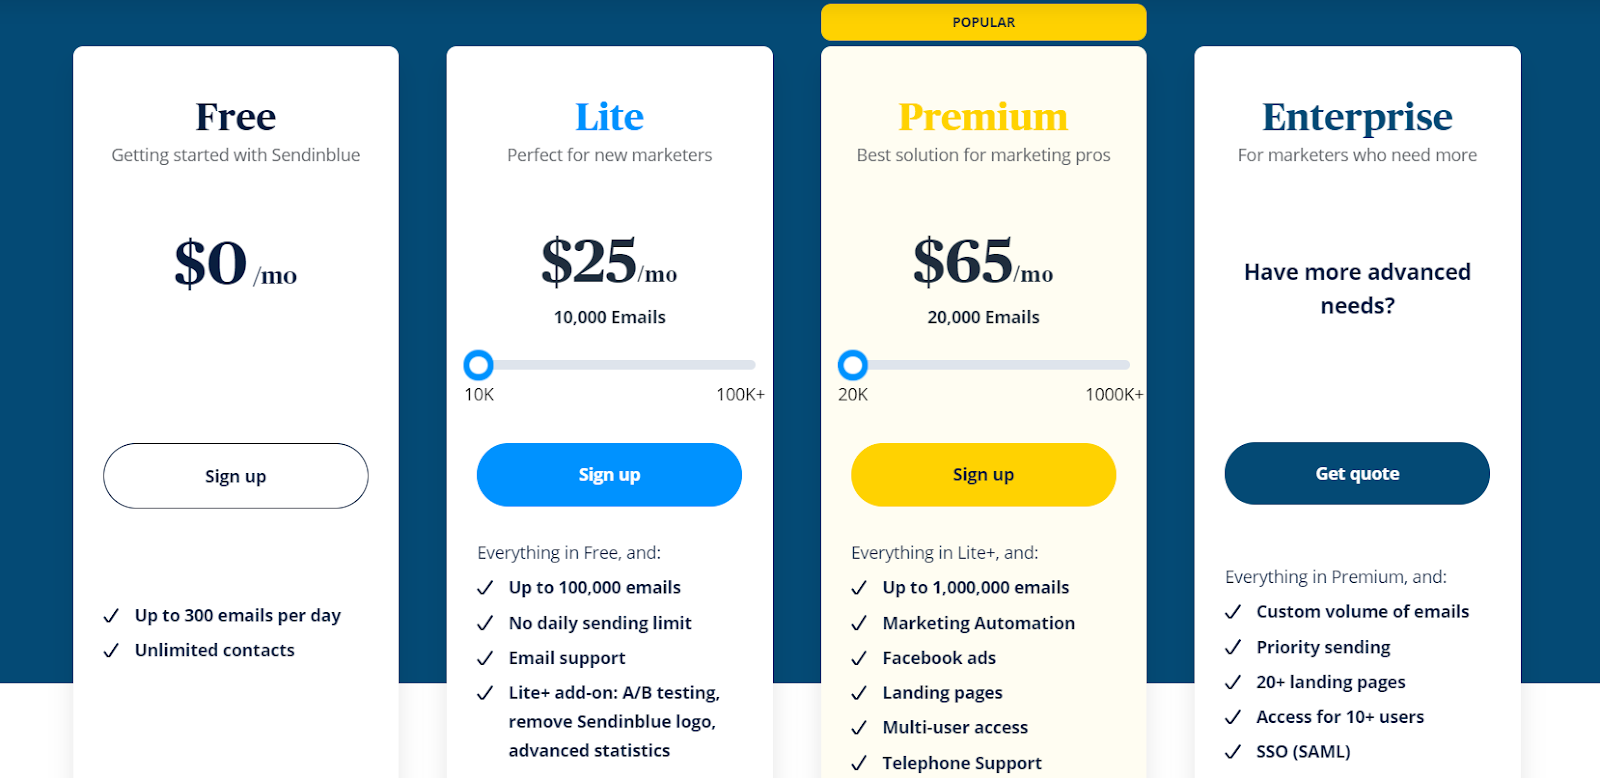 Sendinblue's pricing plans